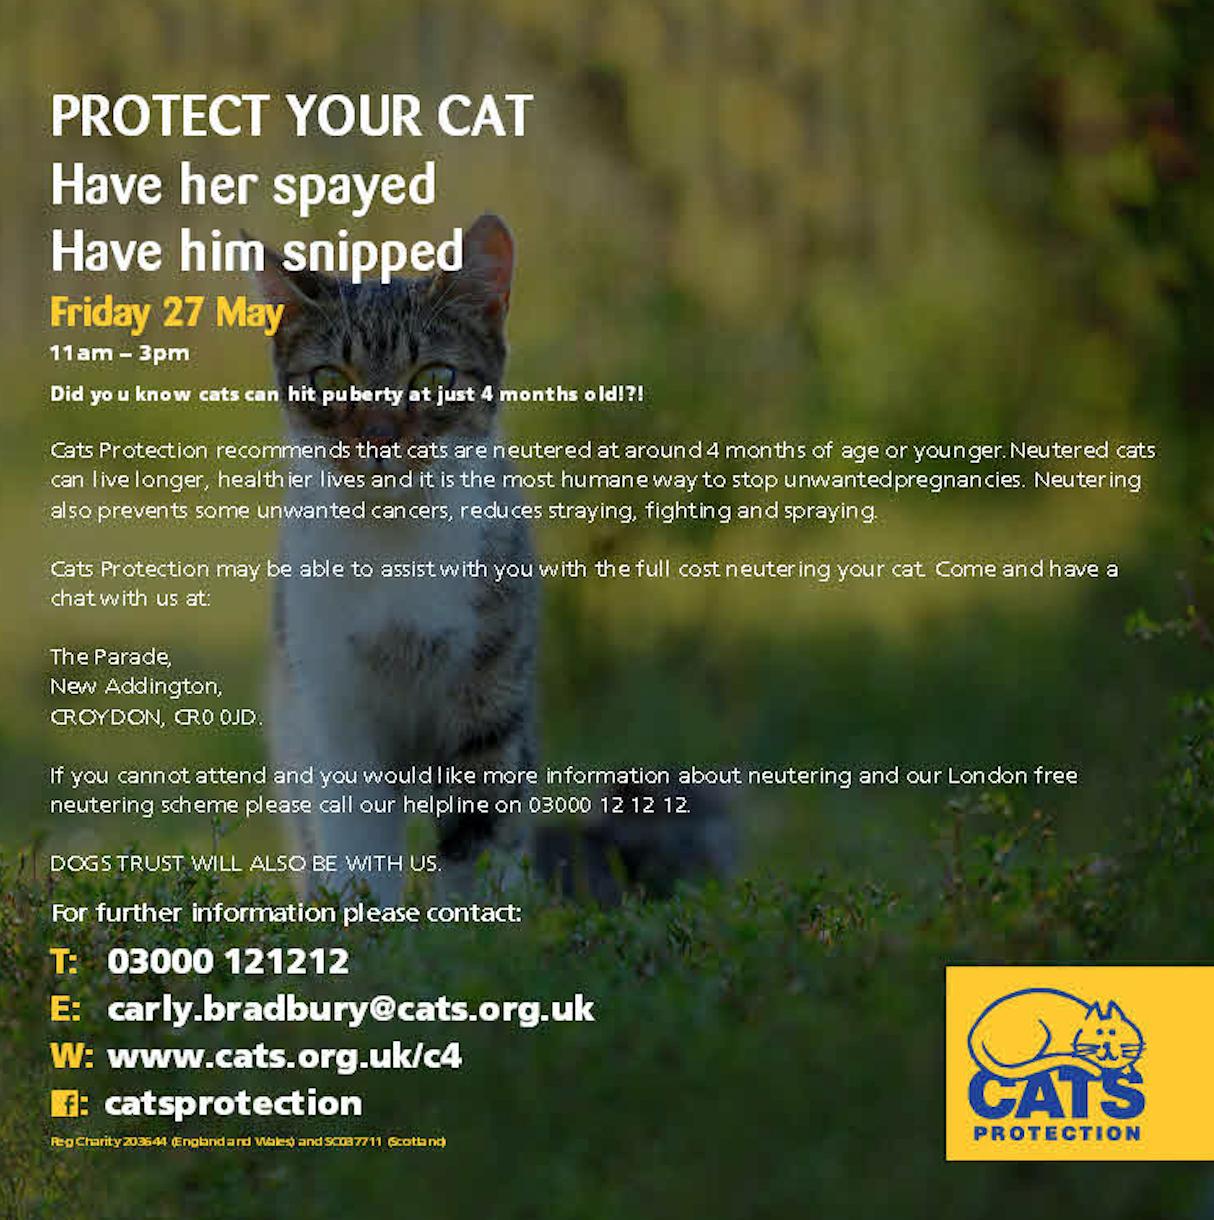 East Croydon Cats Protection